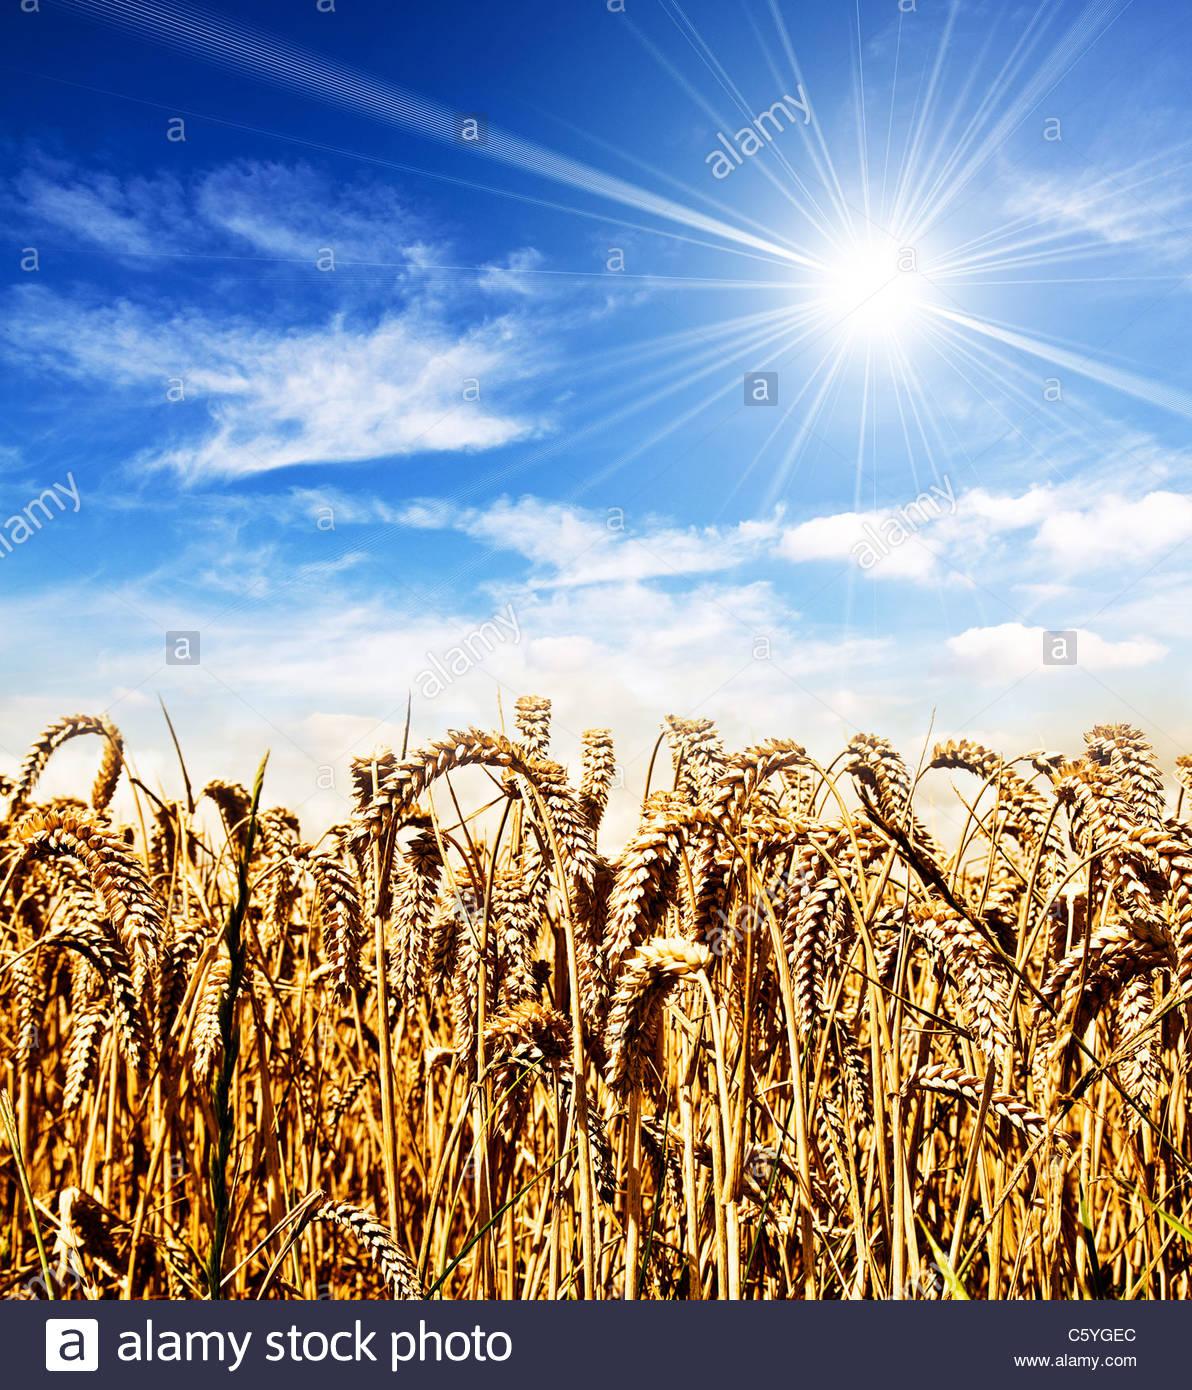 sunshine cornfield - Stock Image